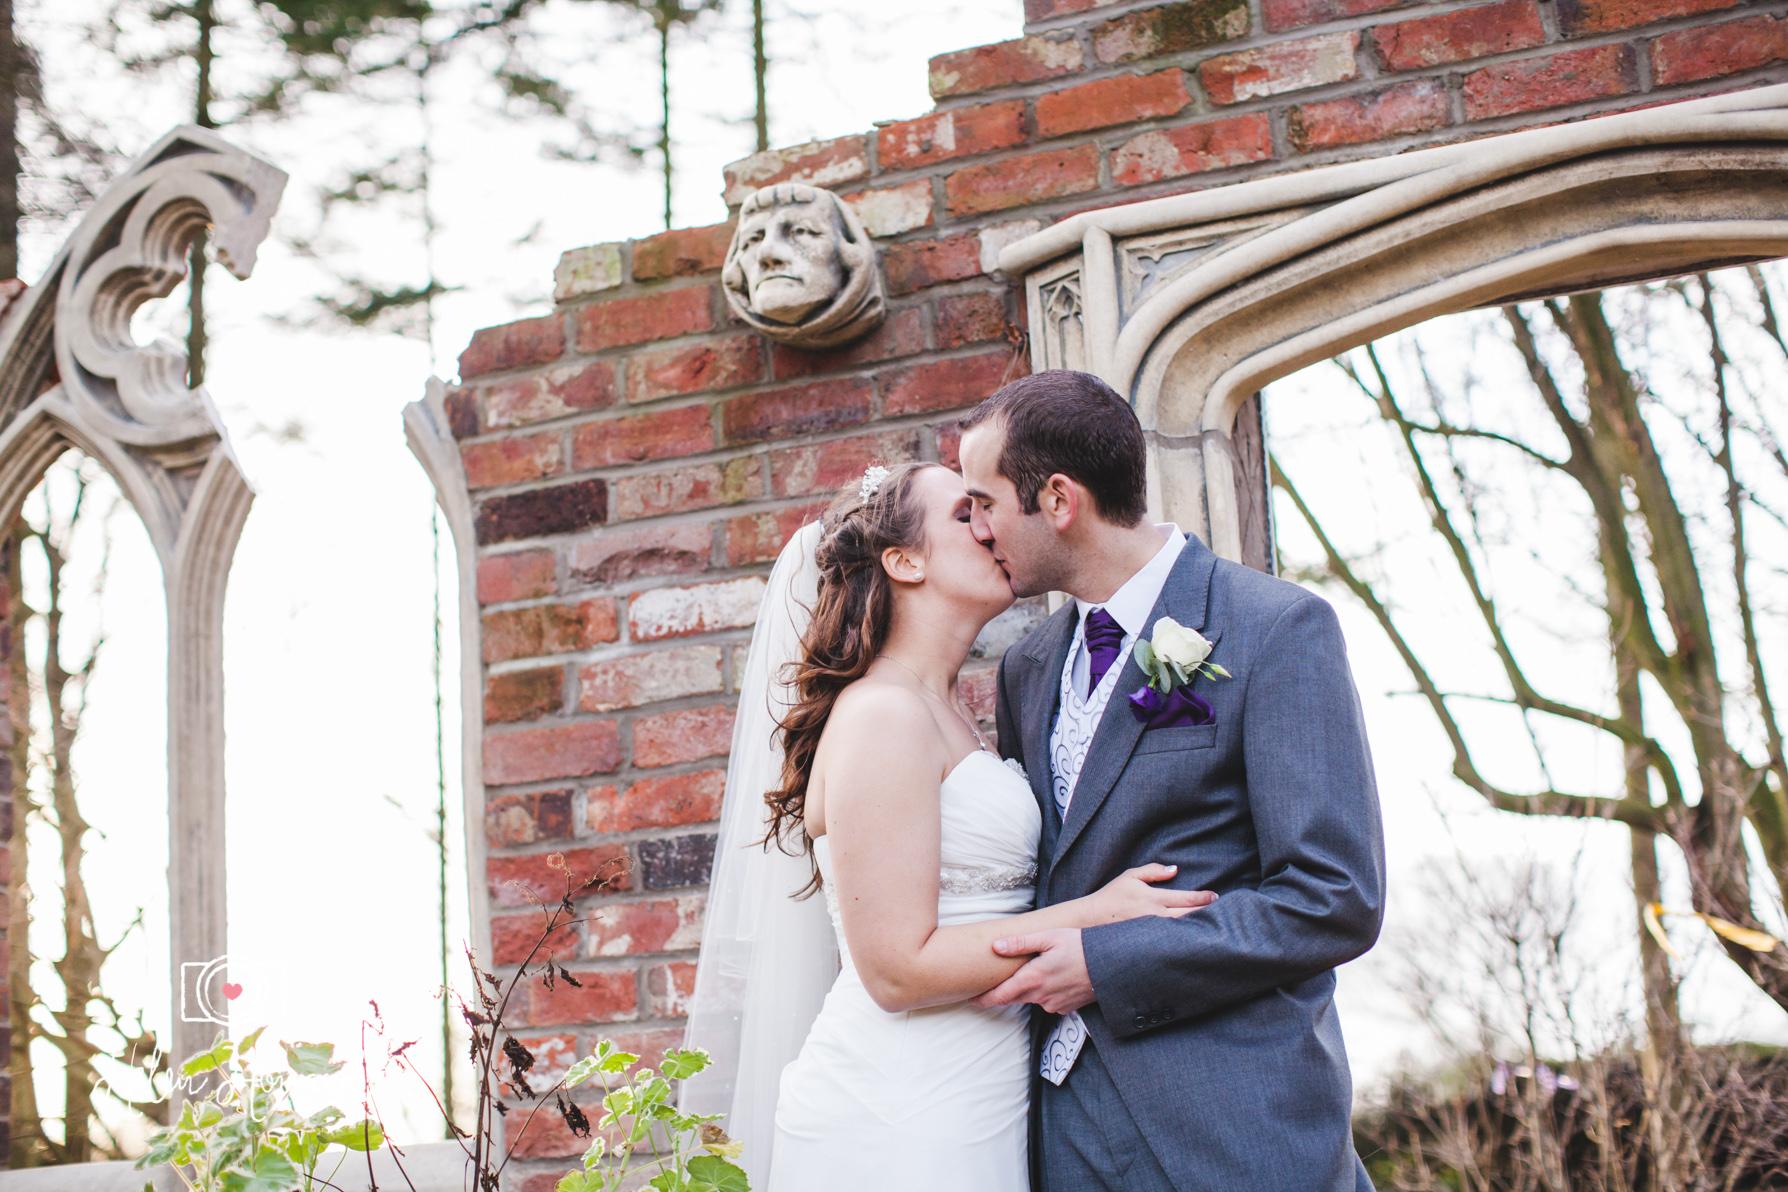 Wedding photography at Moxhull Hall